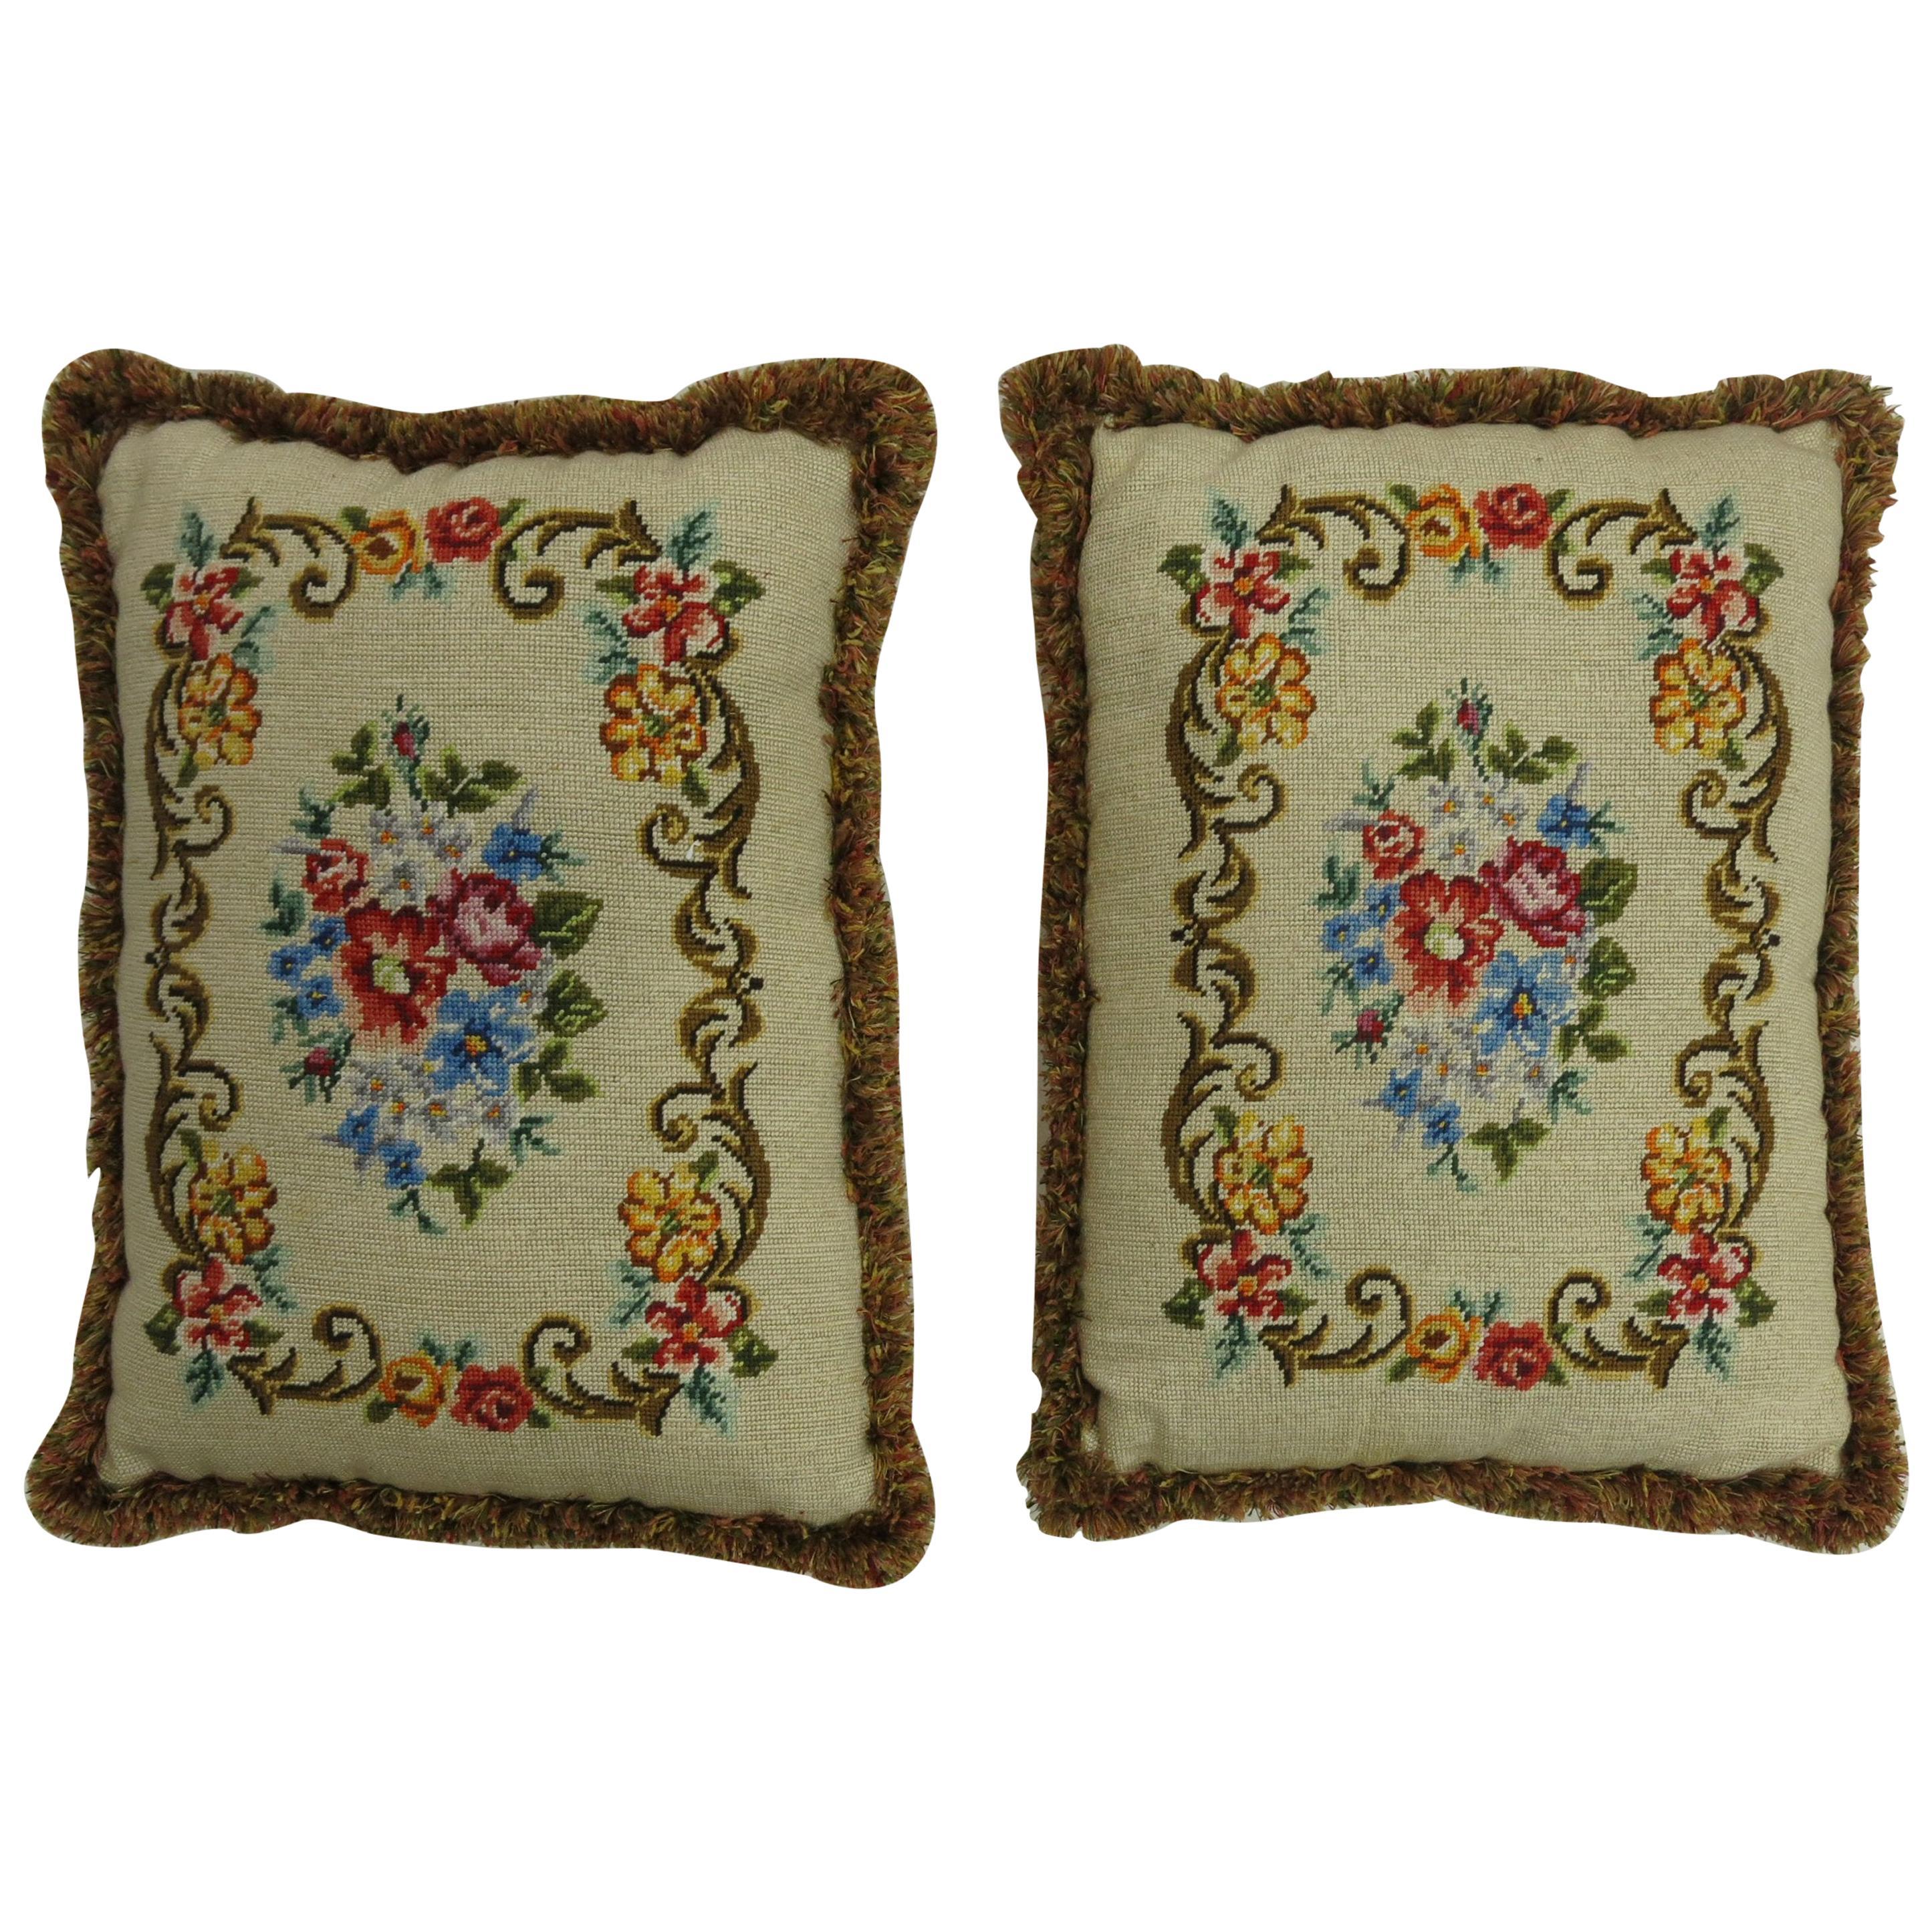 Pair of English Needlepoint Pillows